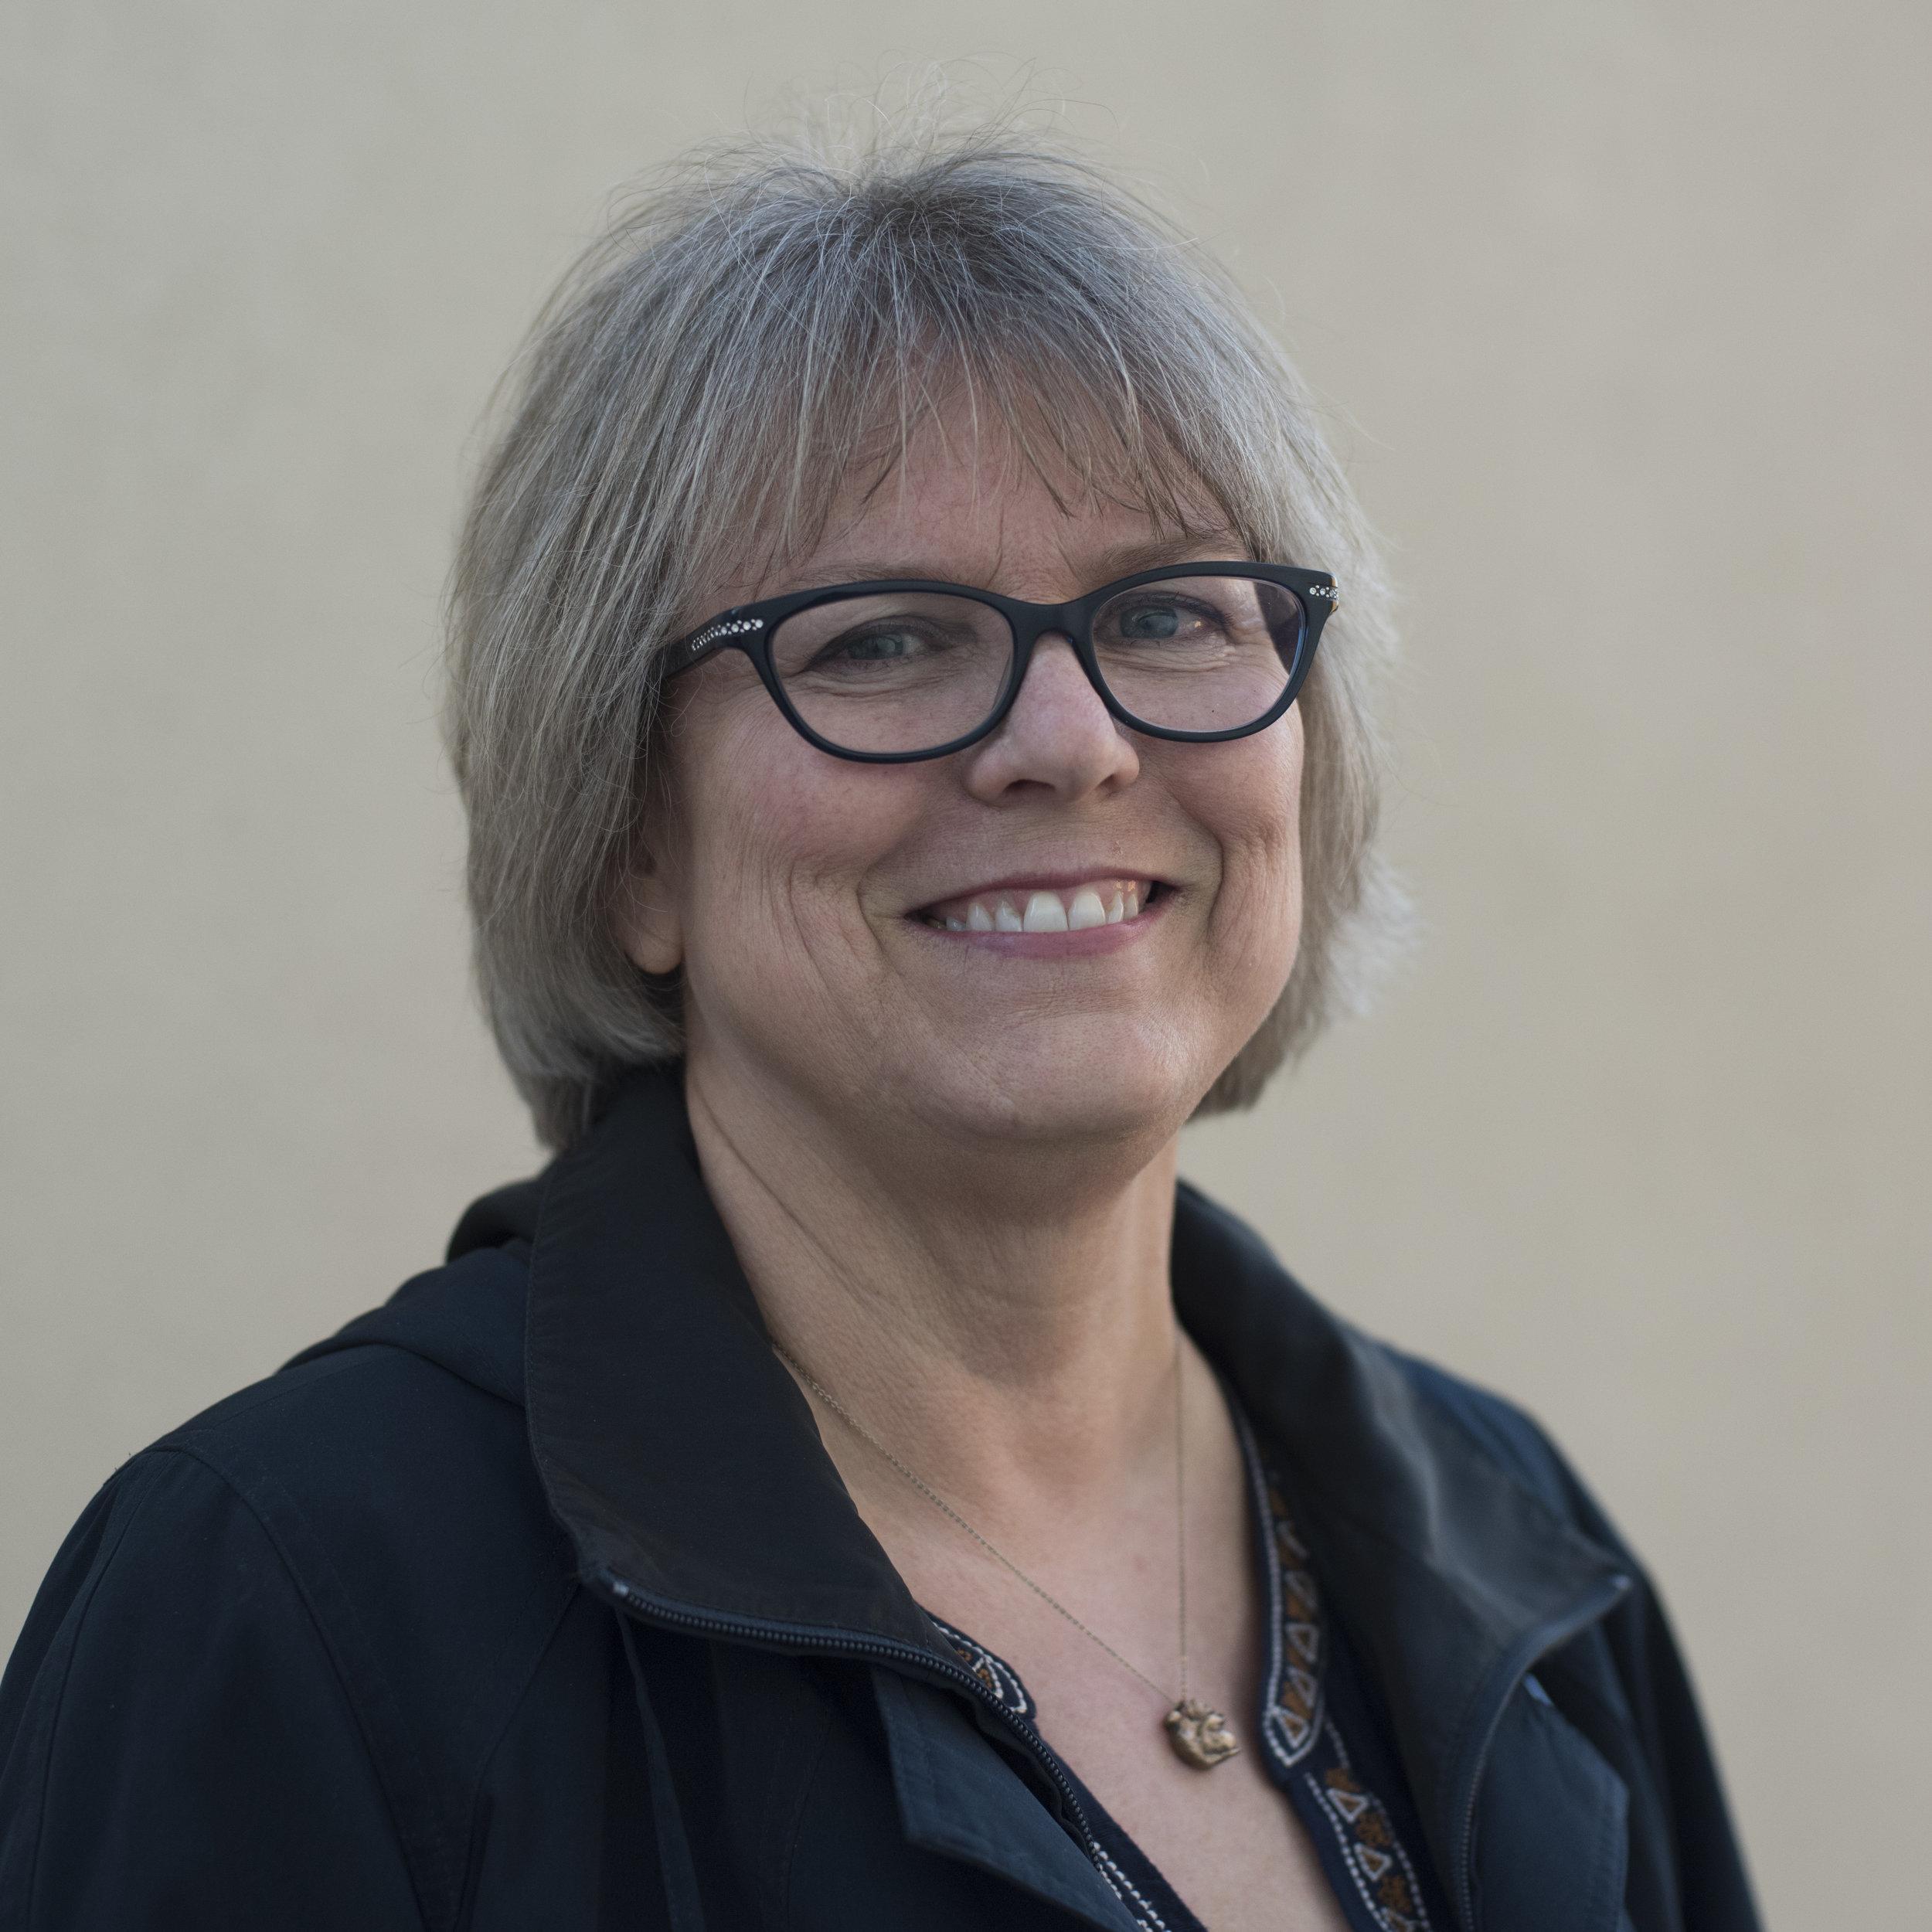 Karla Walden Caraway